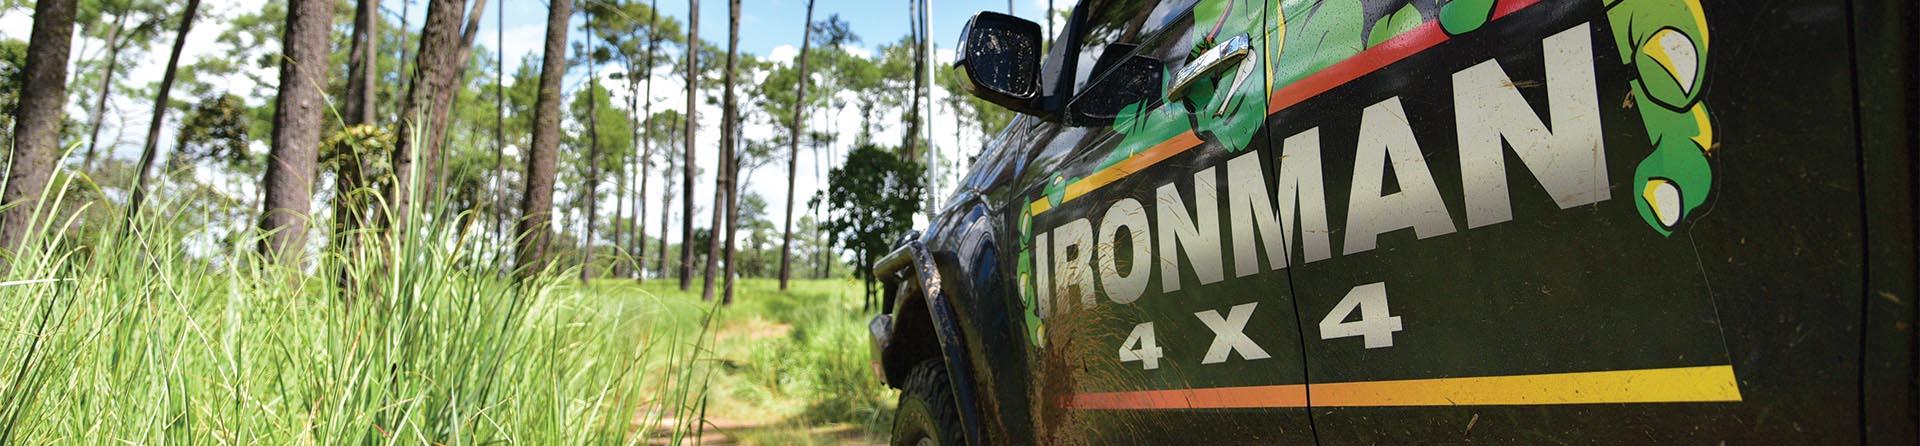 Ironman4x4-PB-Bush